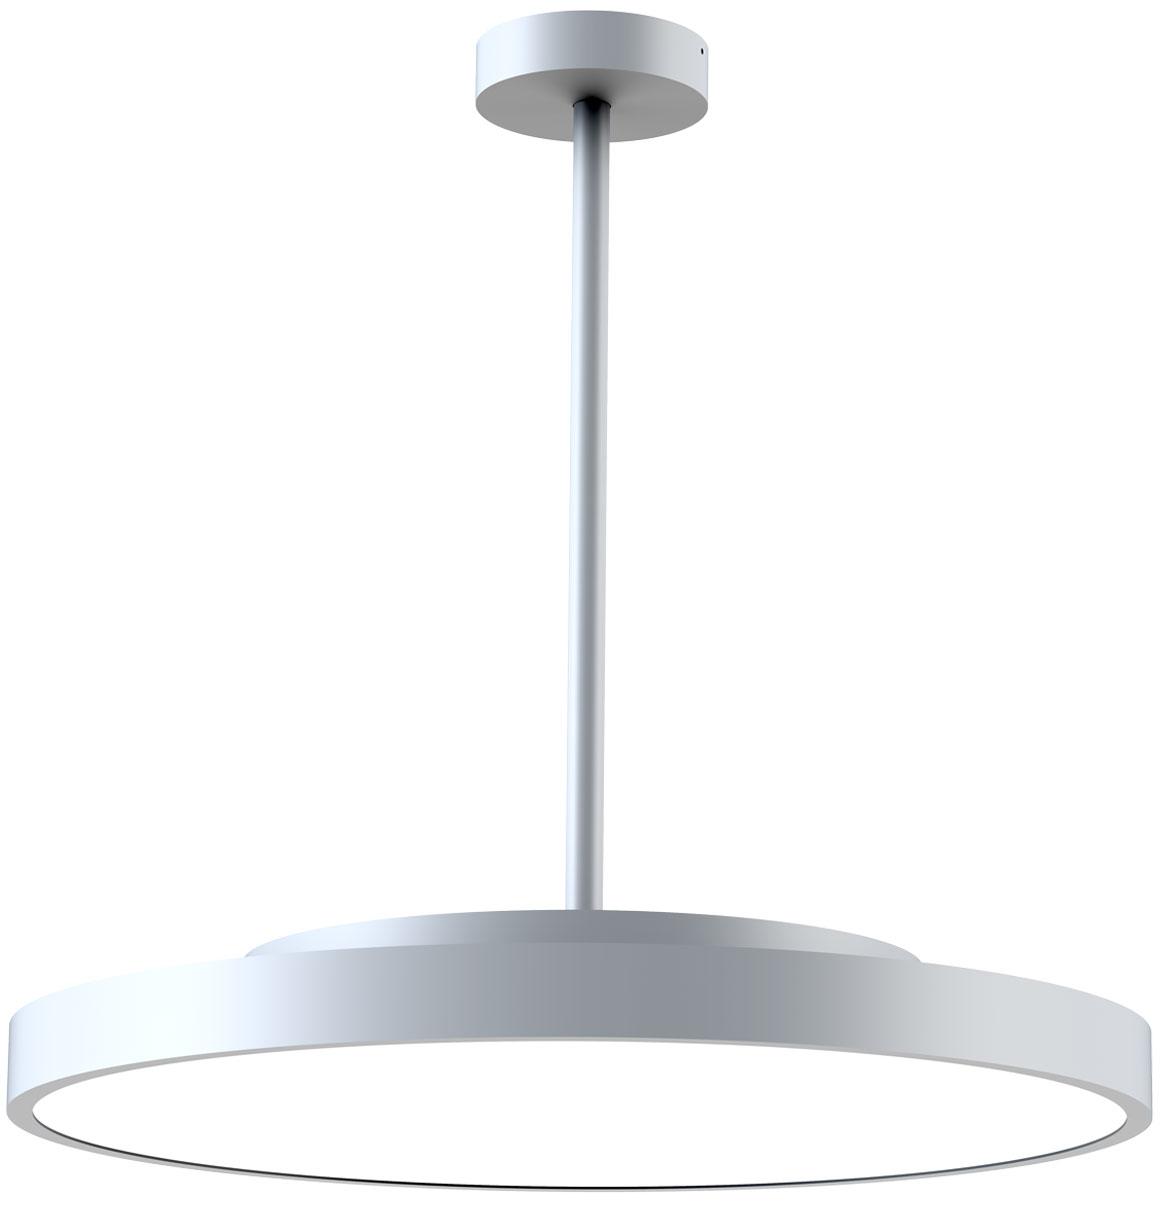 LED-Pendelleuchte PL-14 silber mit Pendelrohr